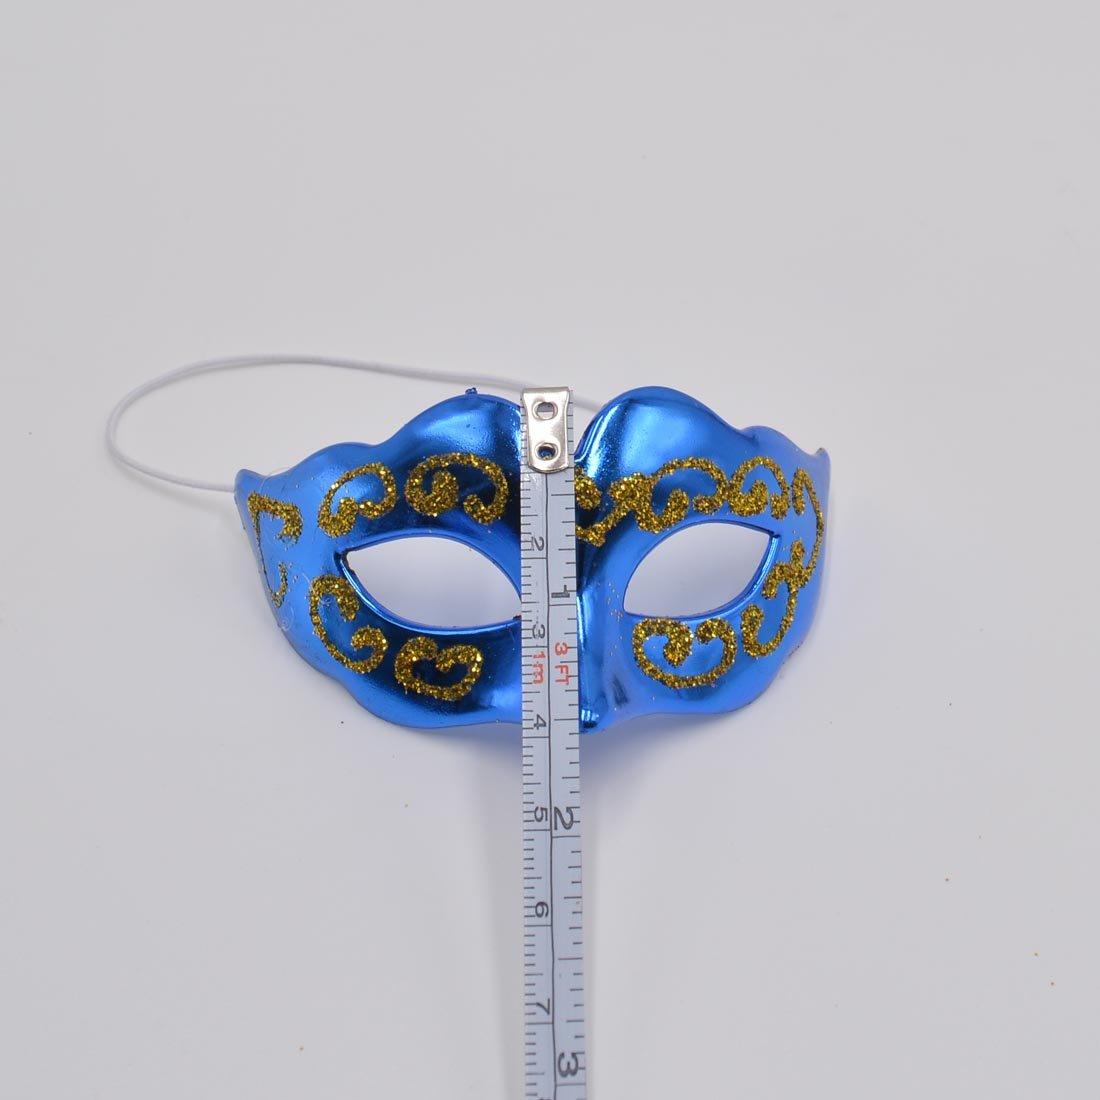 Yiseng Mini Masquerade Mask Party Decoration 10pcs Set Supper Small Masks Mardi Gras Halloween Party Decor Novelty Gifts